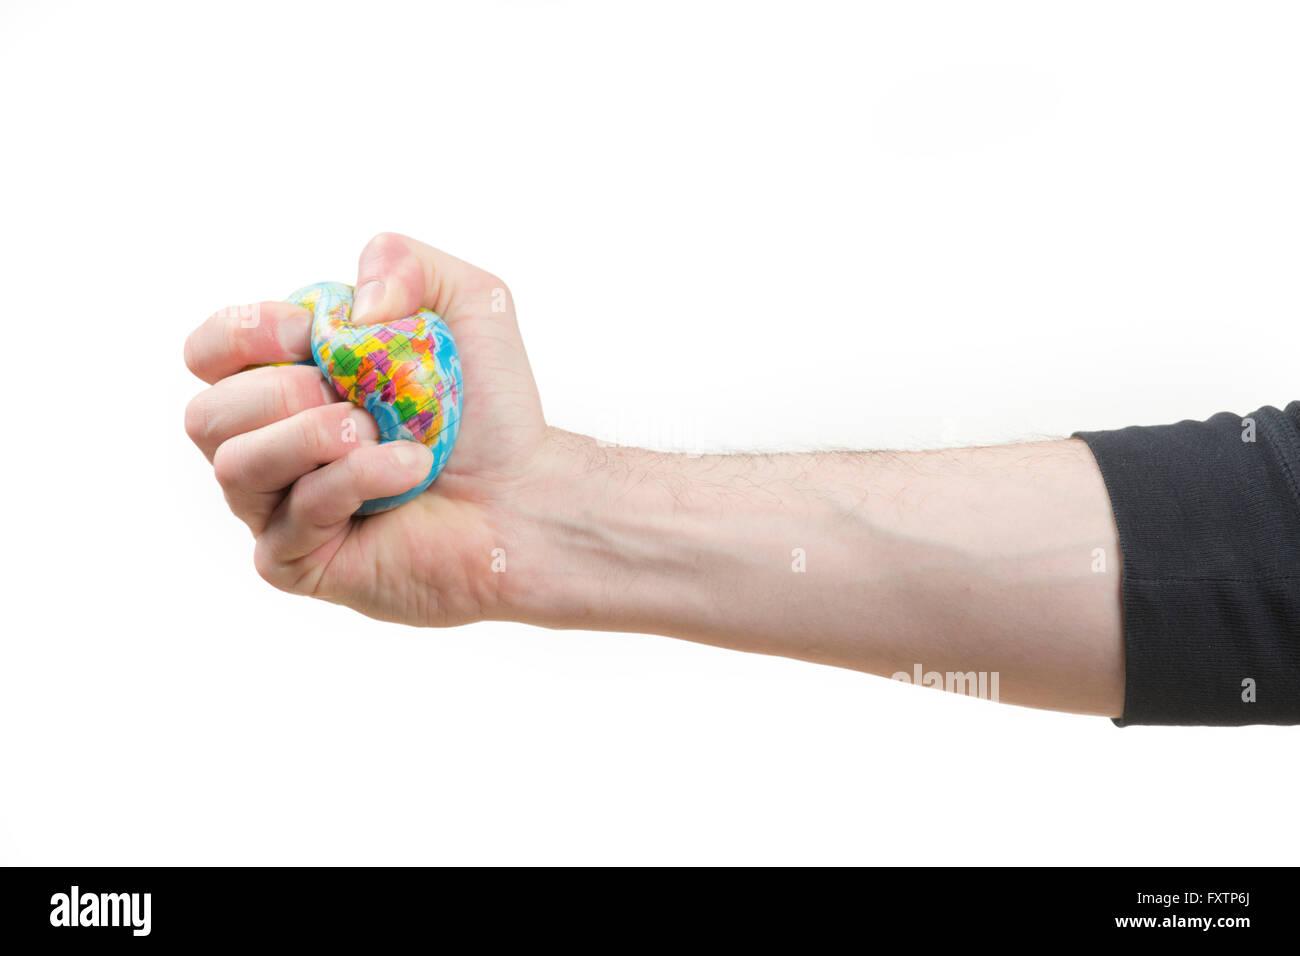 Hand squashing world globe - Stock Image